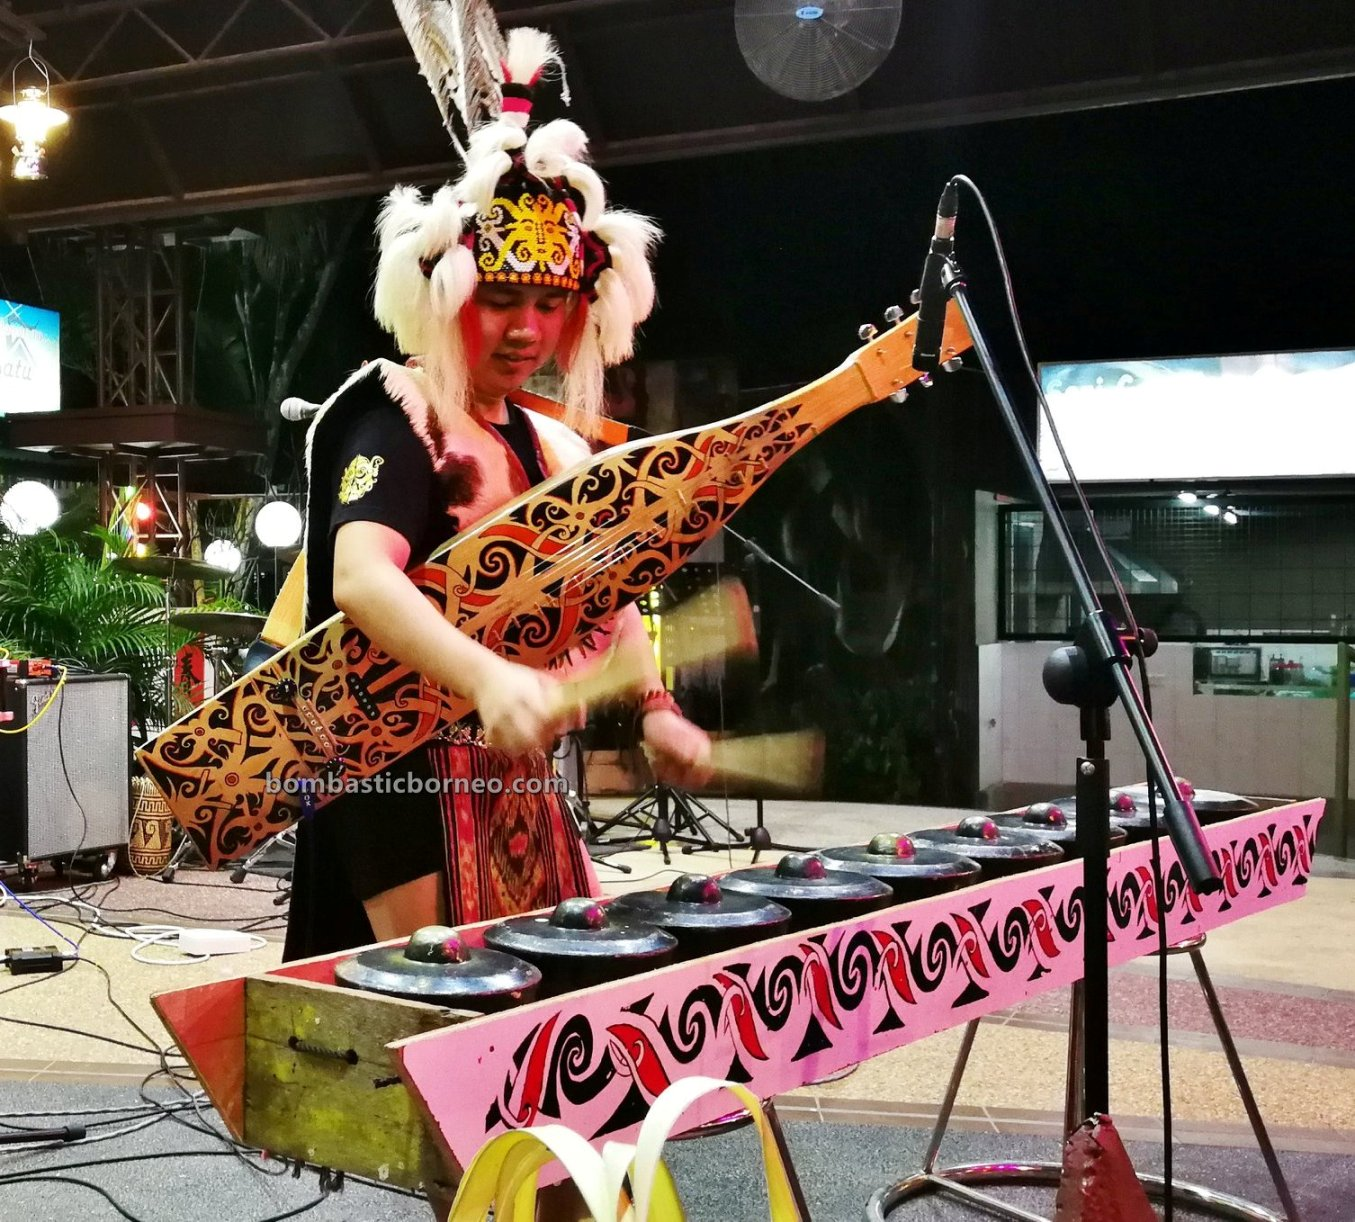 Youth Sape Festival, authentic, traditional, culture, native, tribal, musical instrument, Sibu, Malaysia, Tourist attraction, travel guide, Trans Border, 探索婆罗洲沙贝音乐, 砂拉越原住民吉他, 马来西亚达雅文化